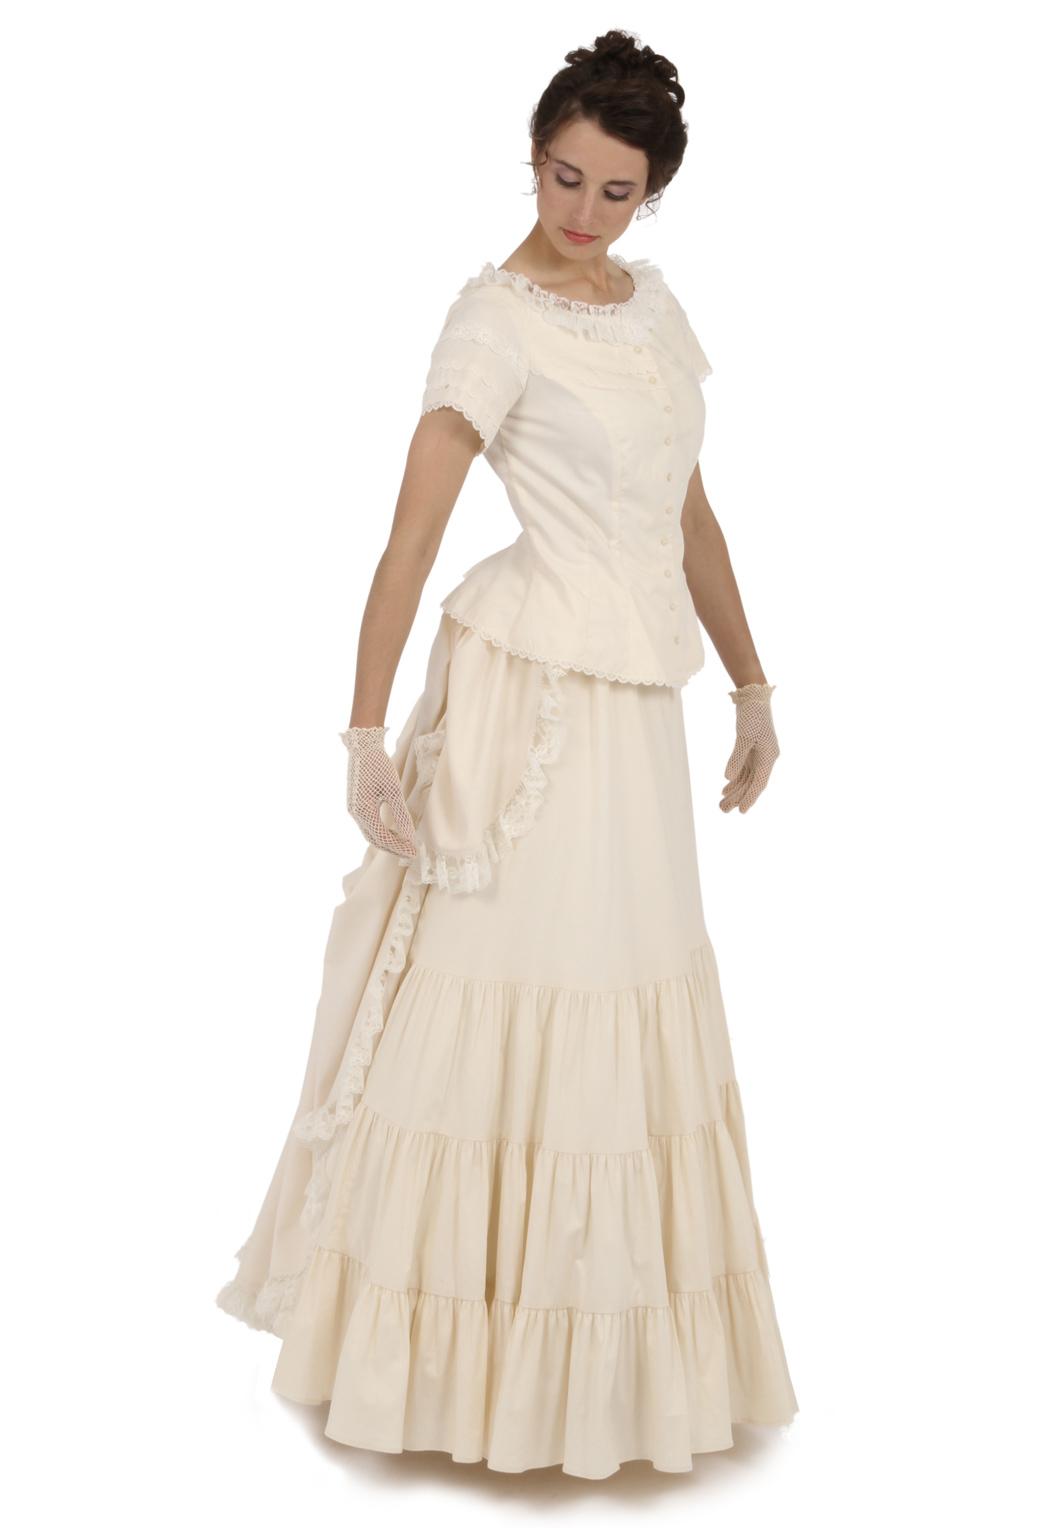 Corset Dresses On Sale